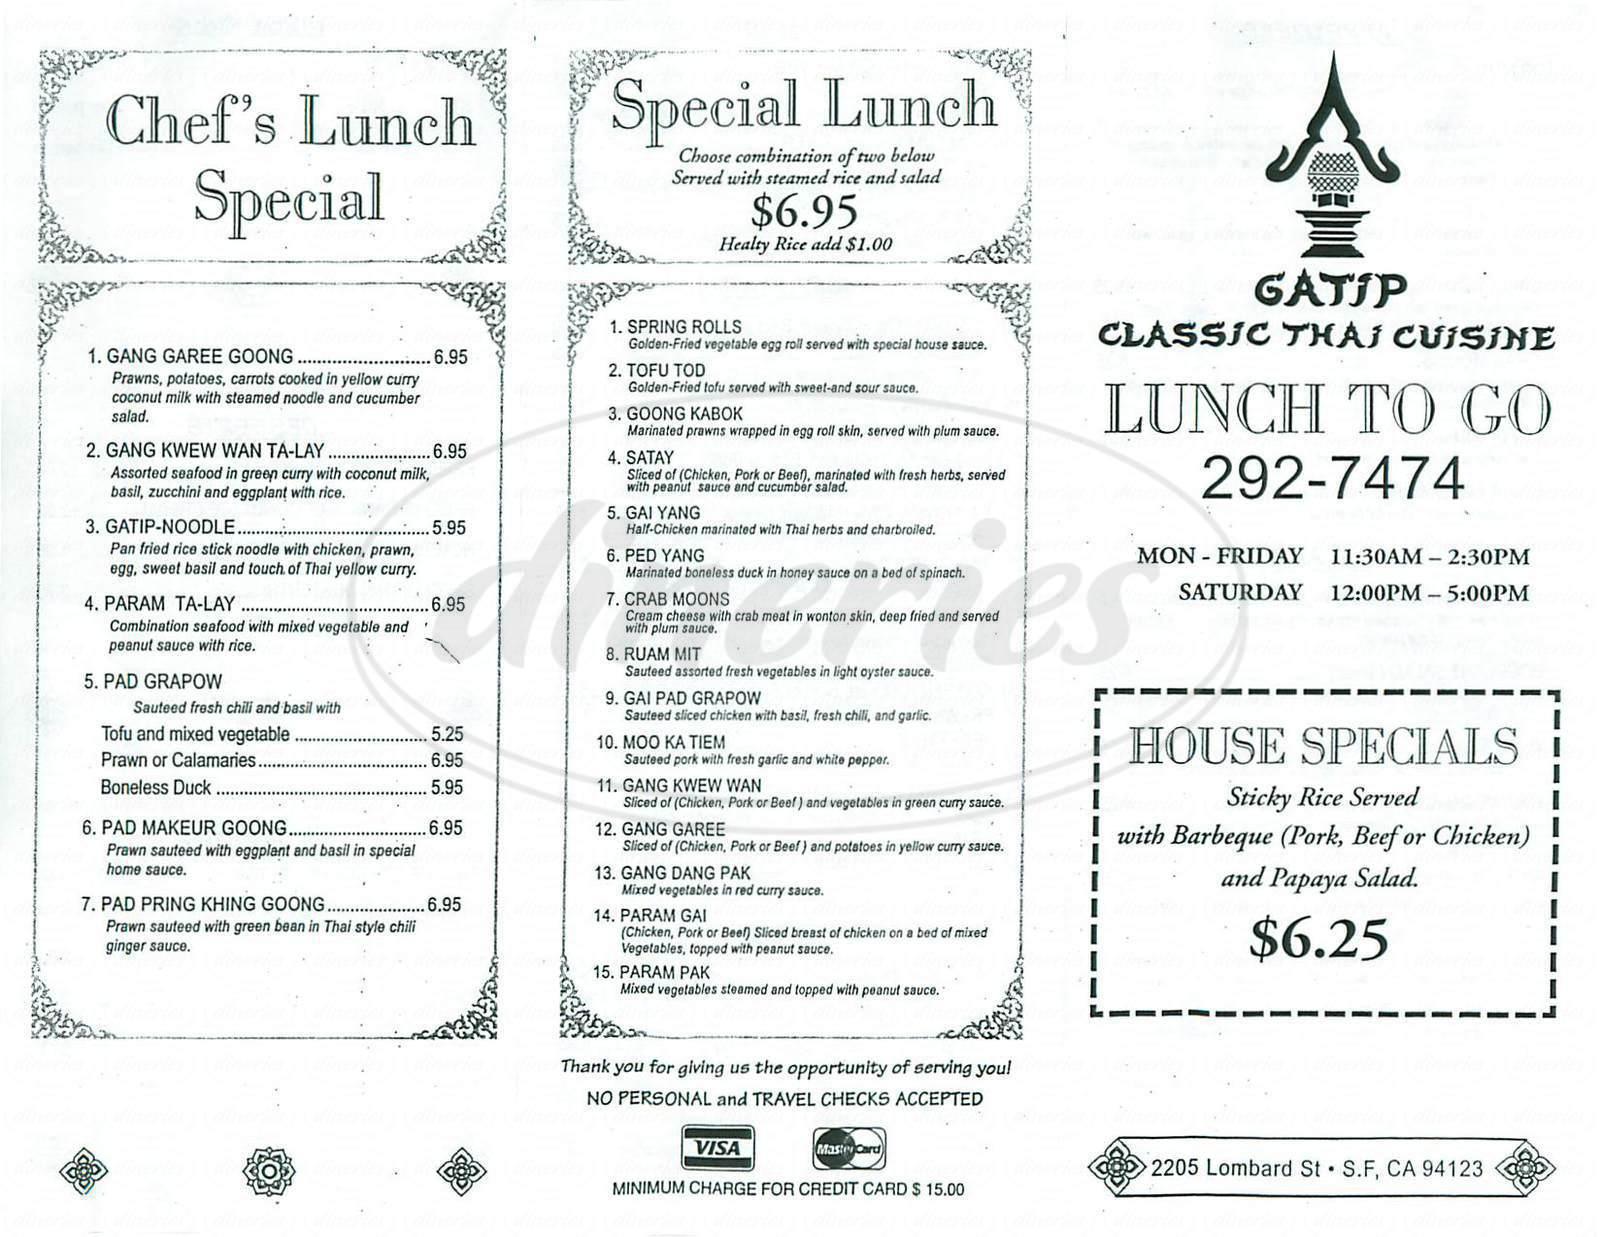 menu for Gatip